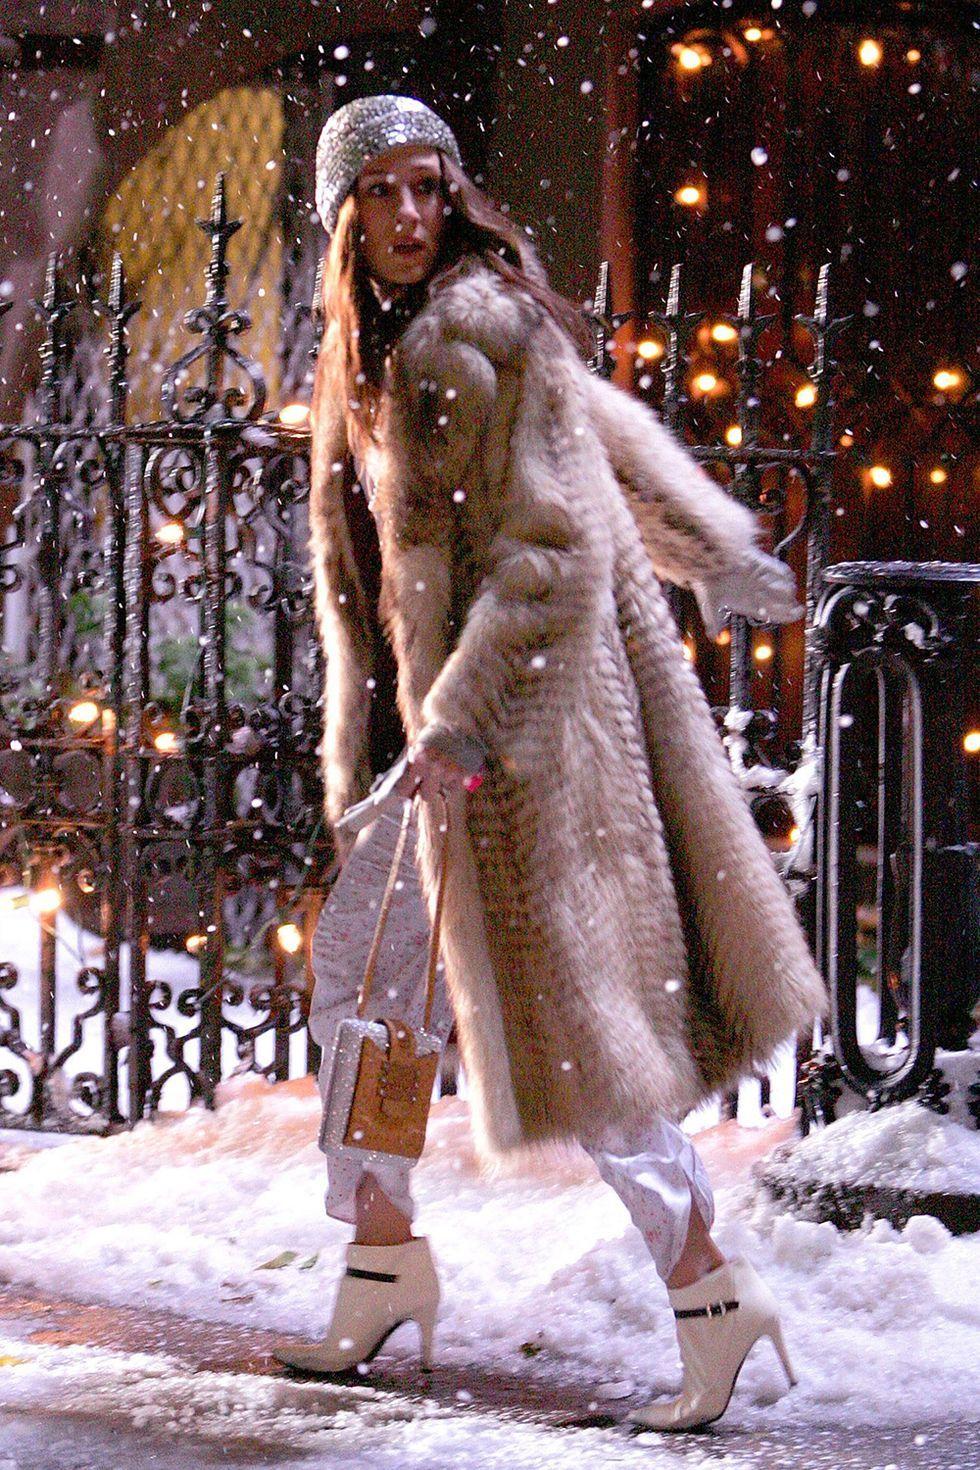 Padu-padan Coat yang Terinspirasi dari Film Ikonik Hollywood